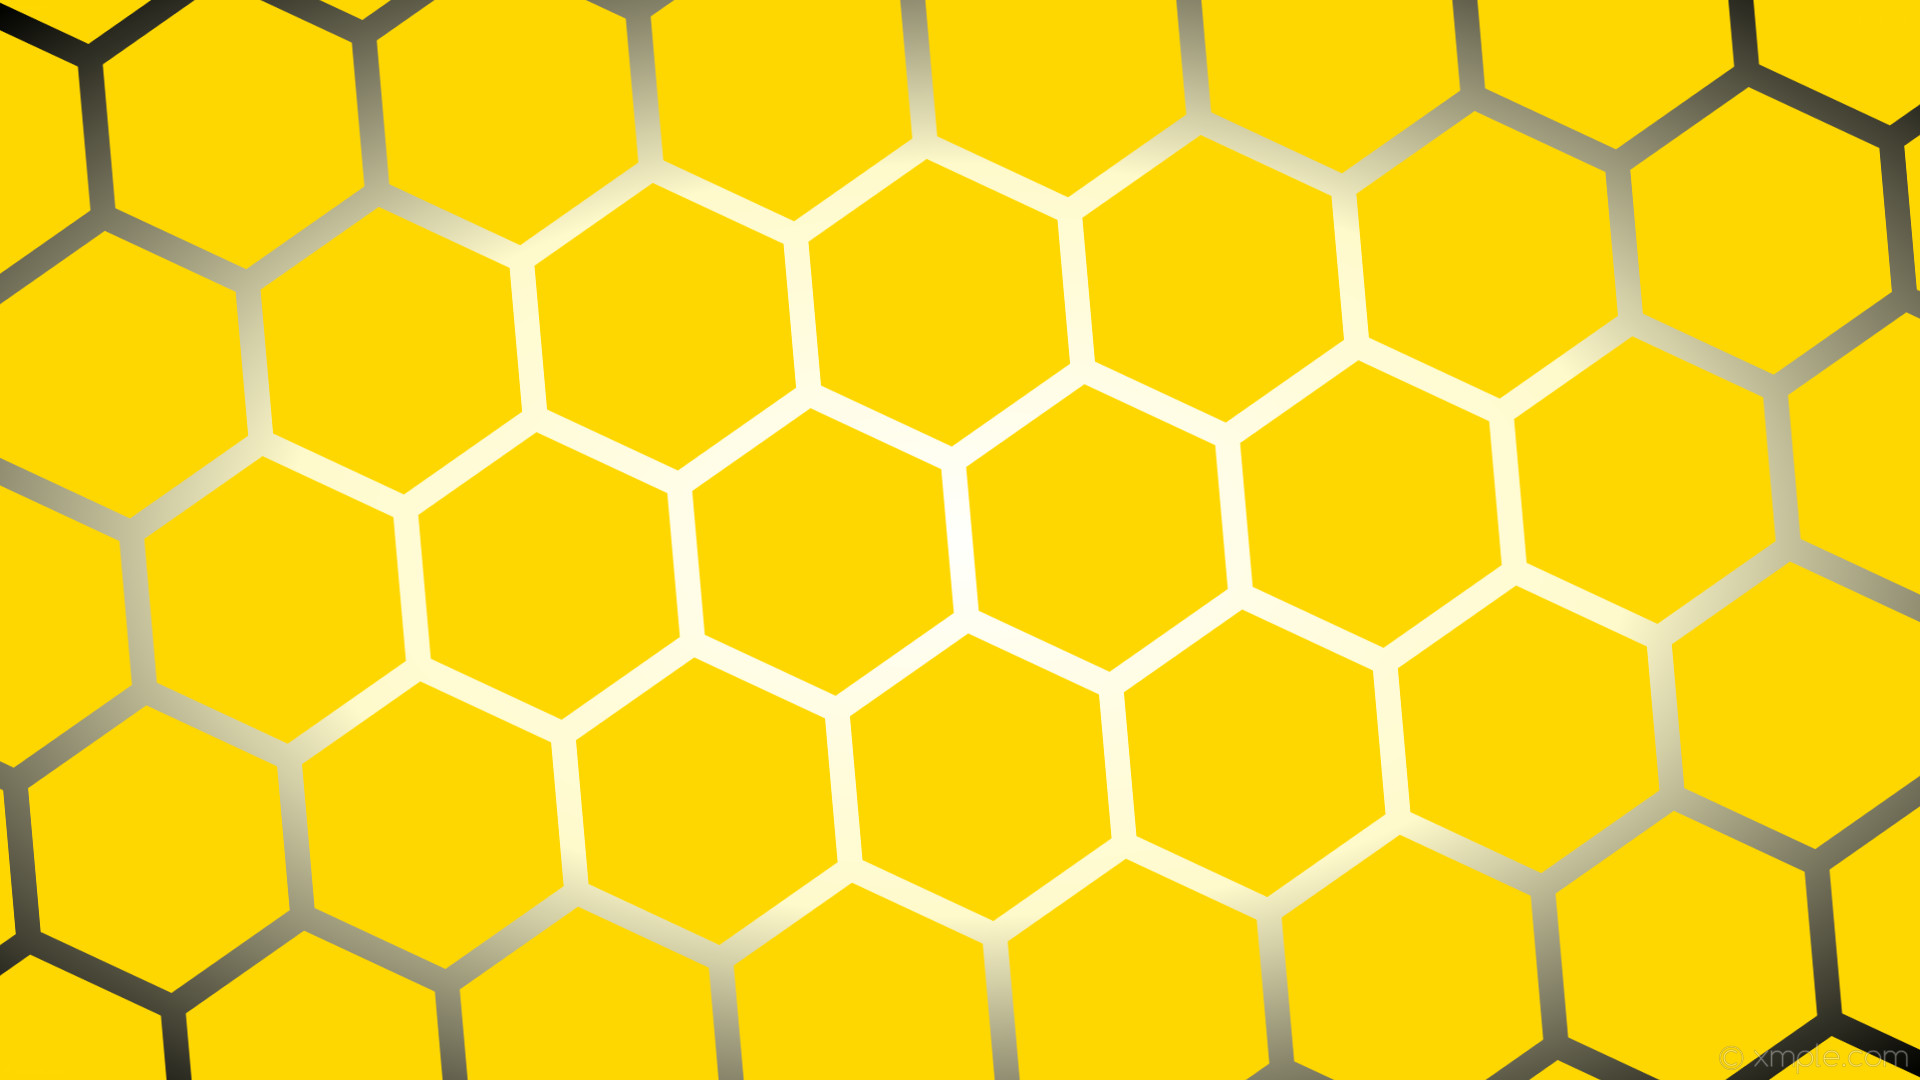 wallpaper yellow black white glow hexagon gradient gold lemon chiffon  #ffd700 #ffffff #fffacd